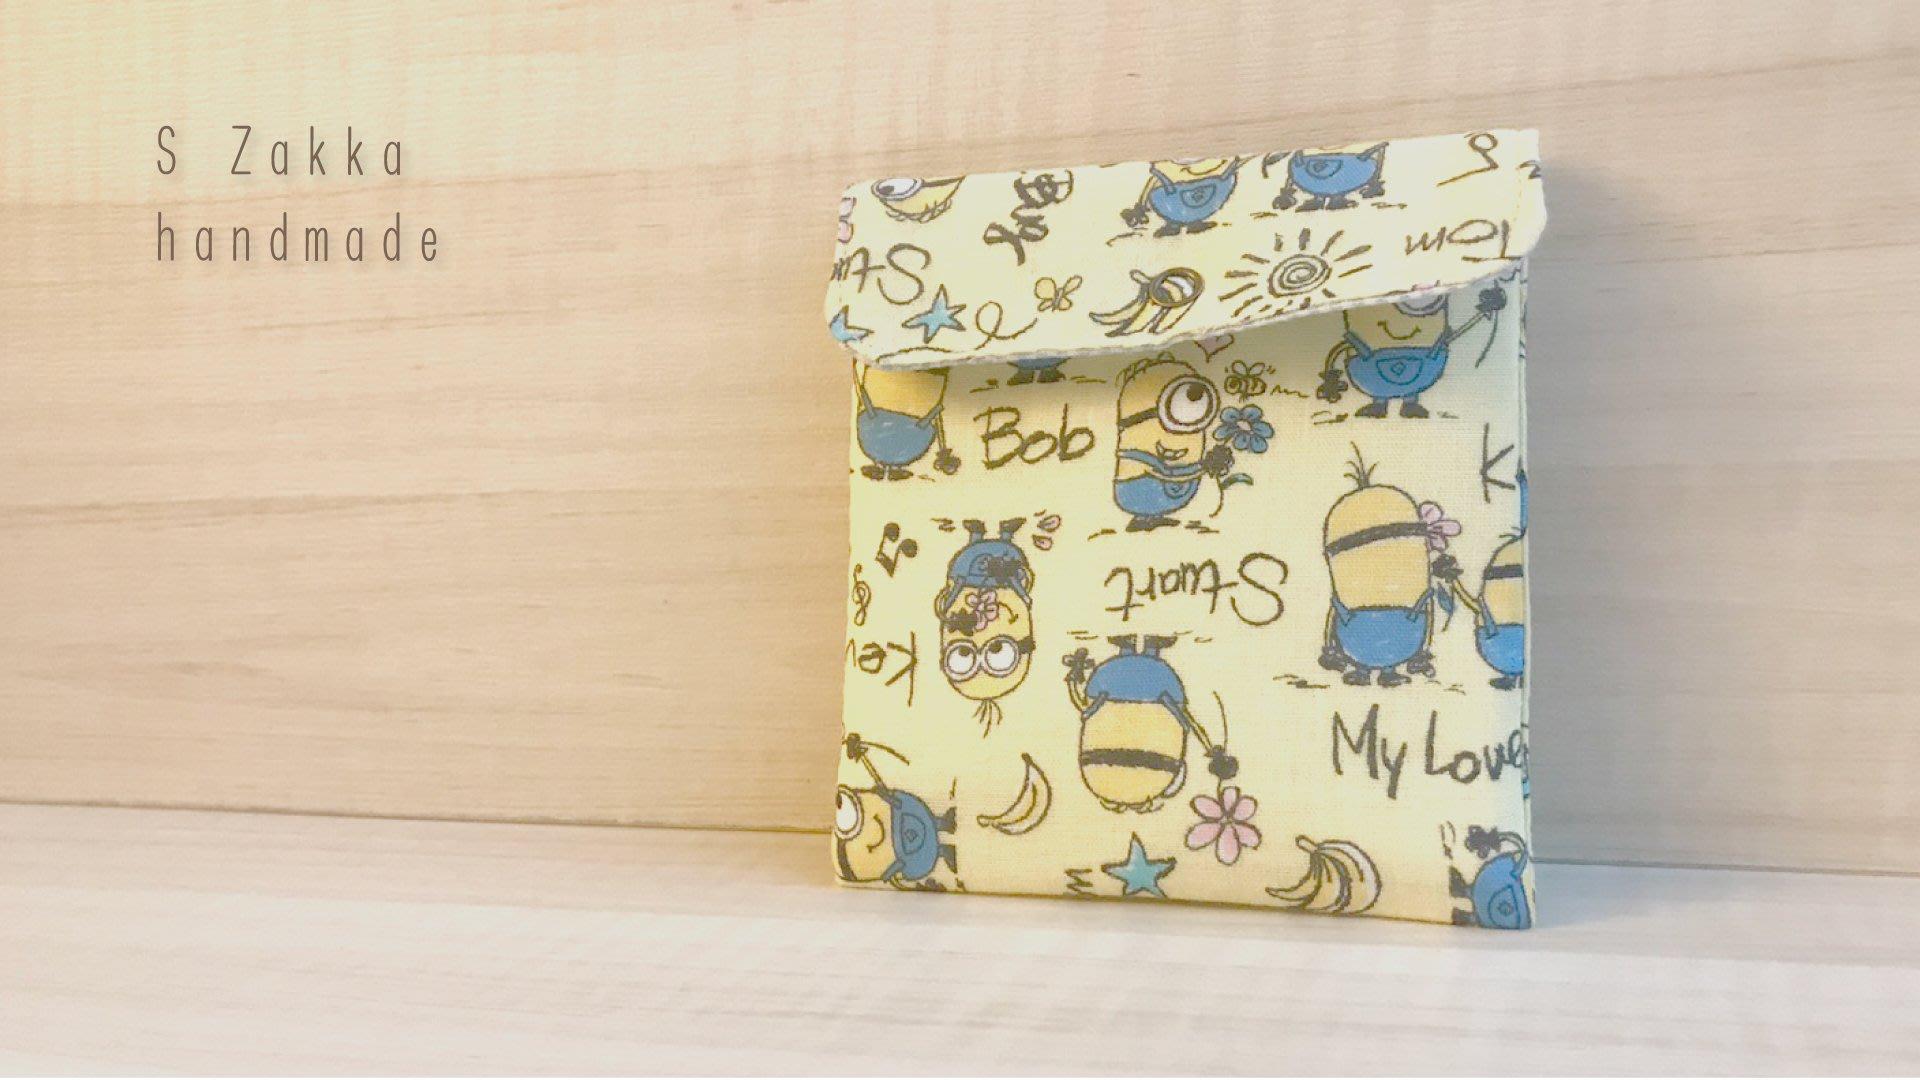 S ZAKKA 口罩收納包 可愛卡通布  尺寸寬12 x 長13 cm 收納口罩或外出小物品